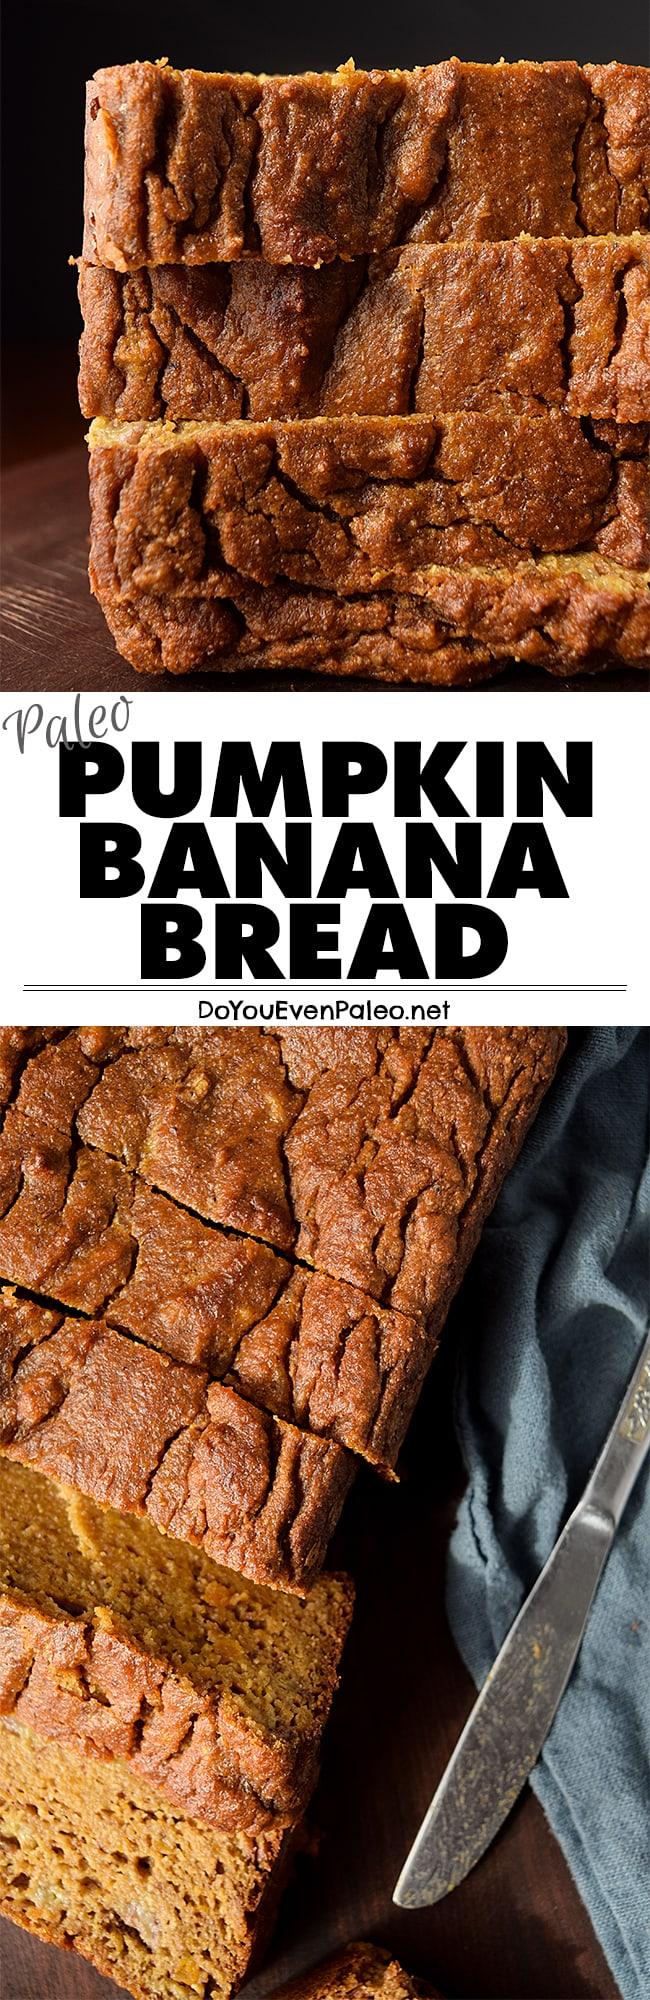 Pumpkin Banana Bread | DoYouEvenPaleo.net